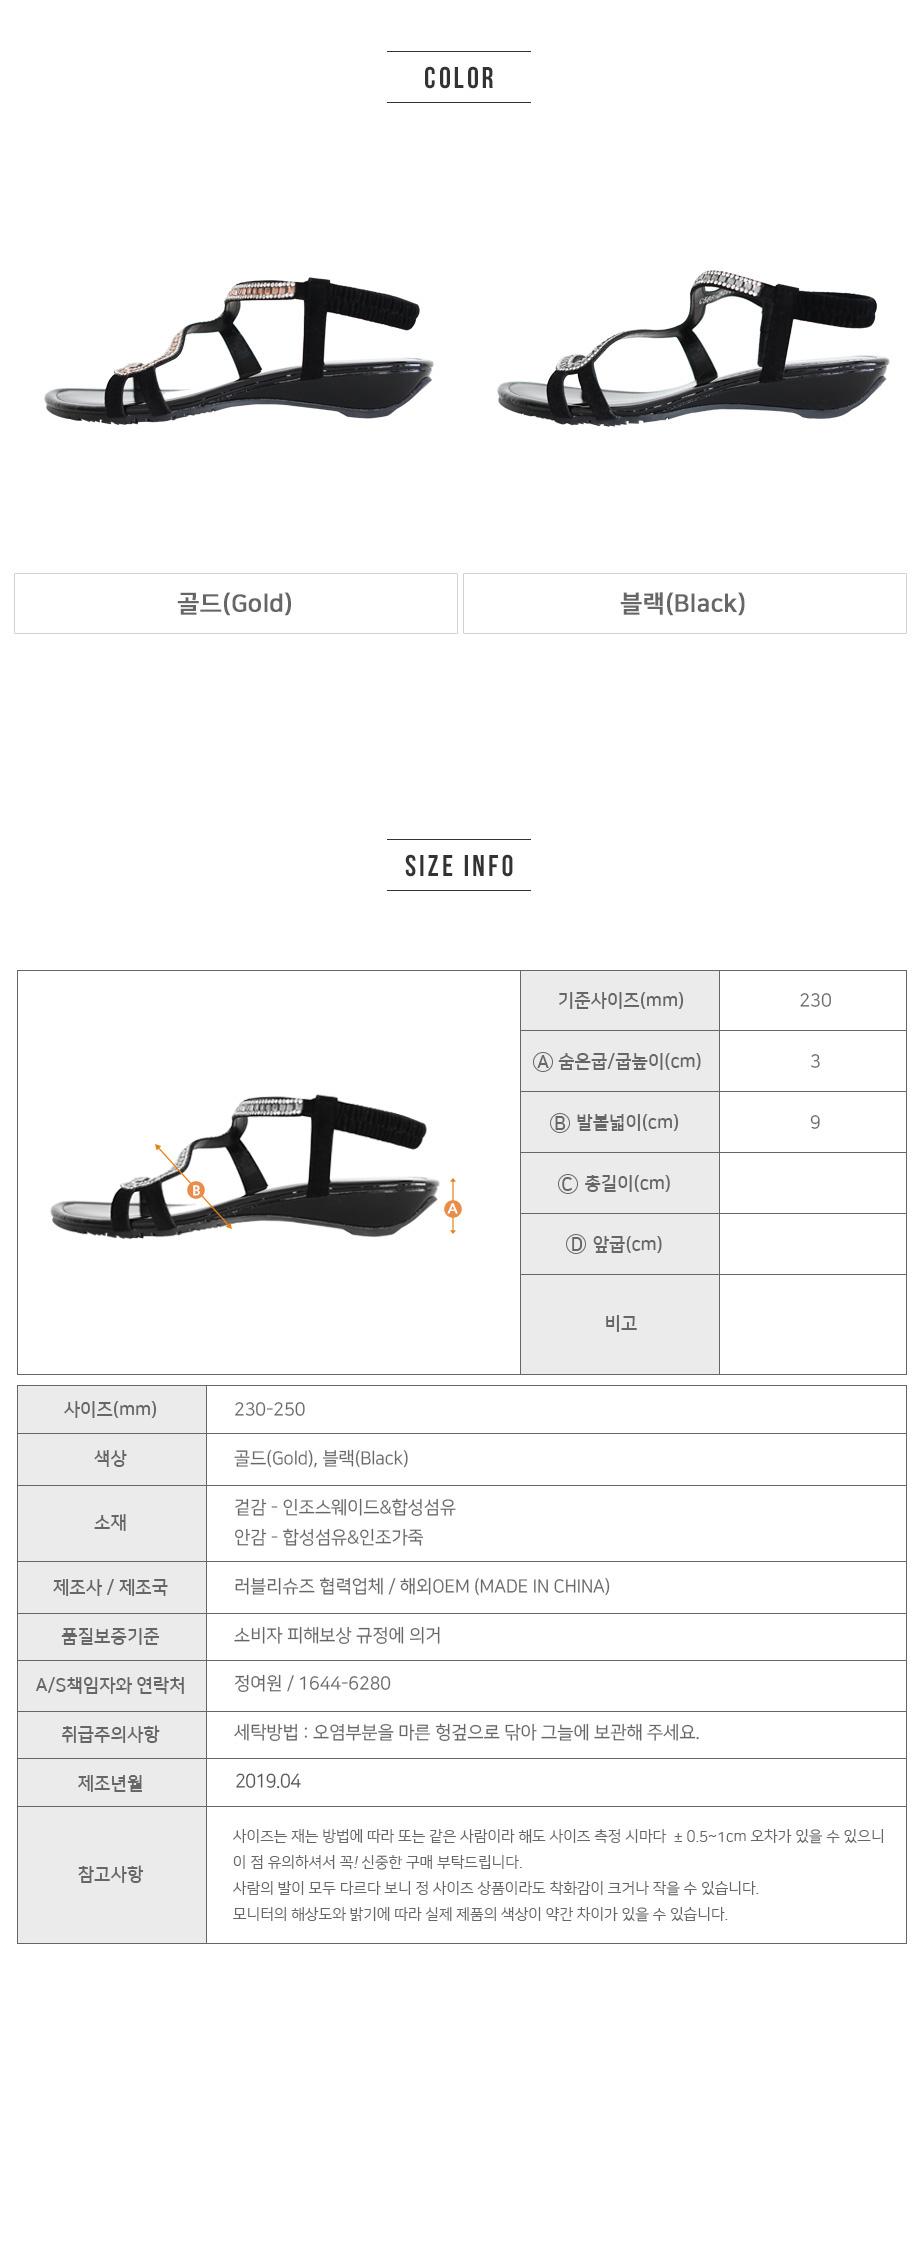 Sneace Wedge Slingback Sandals 3cm